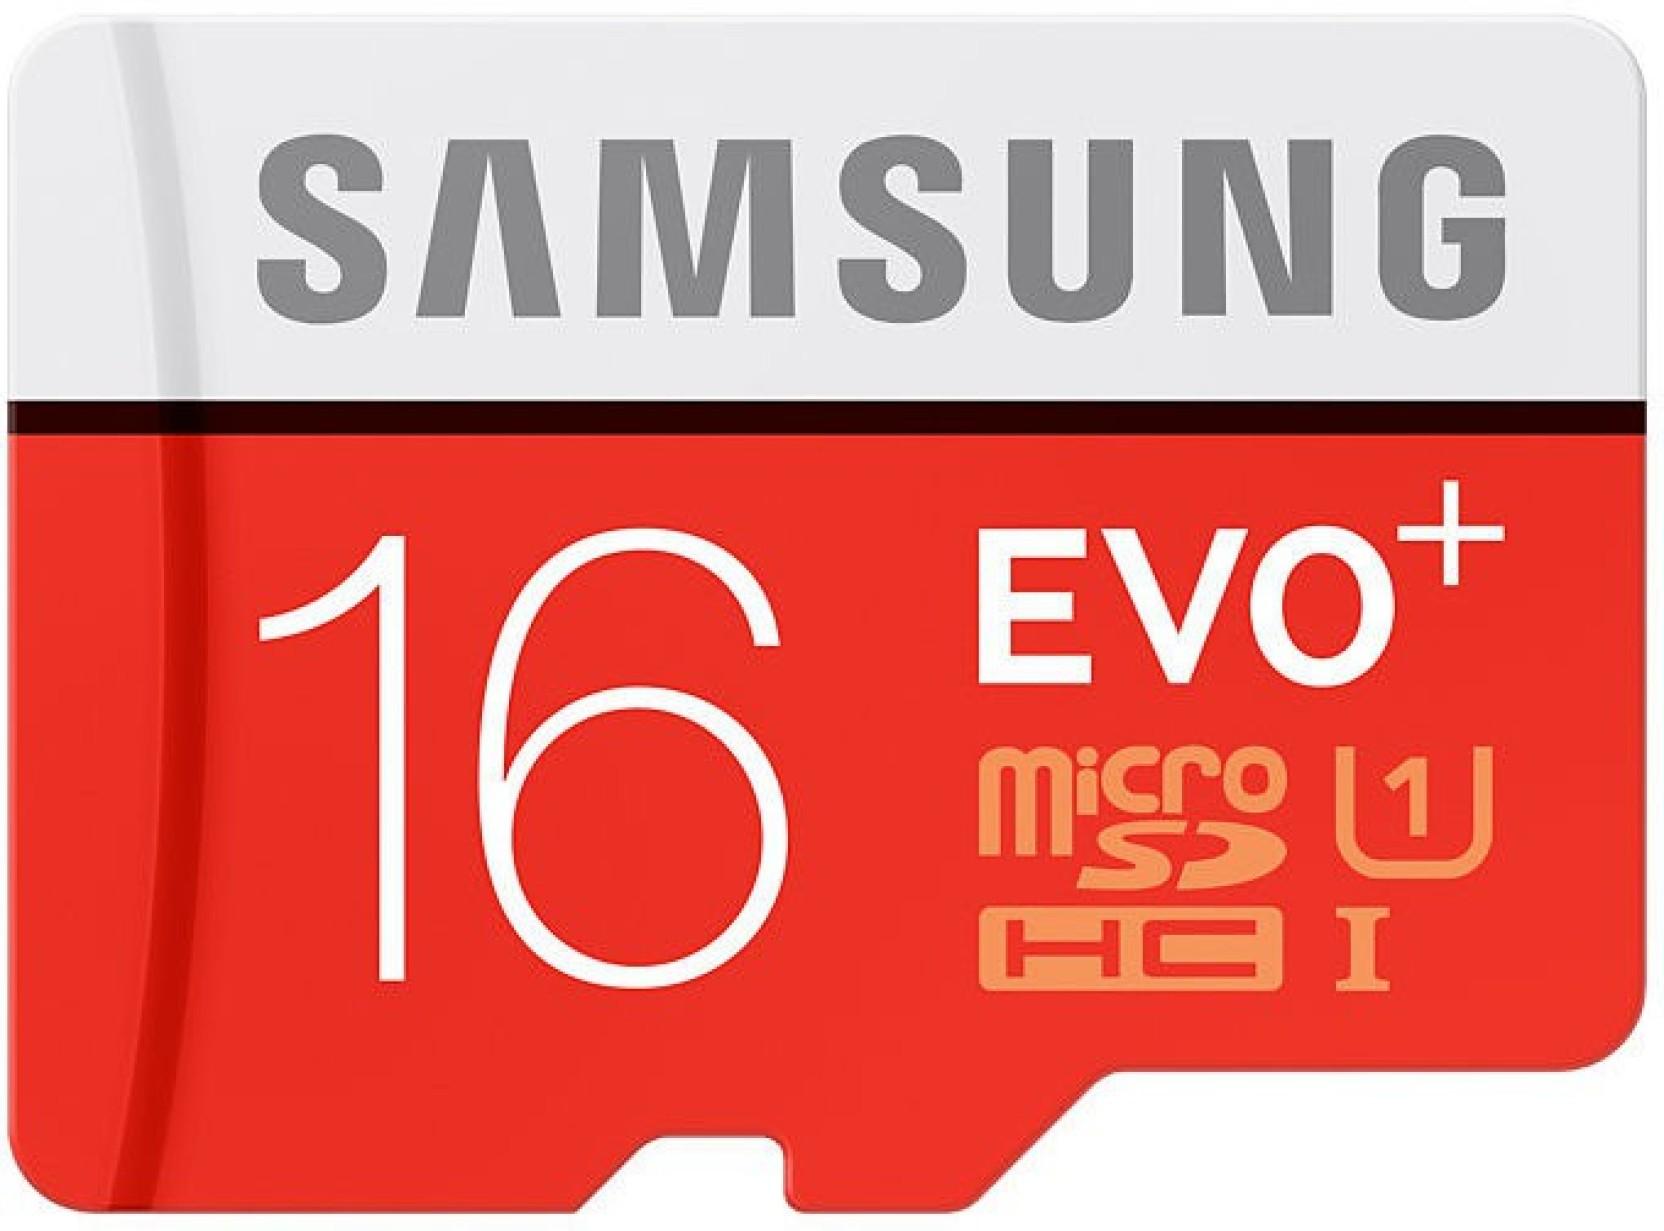 Samsung Evo Plus 16 Gb Microsdhc Class 10 80 Mb S Memory Card Sandiskultra Microsd 32gb 48mbps Add To Cart